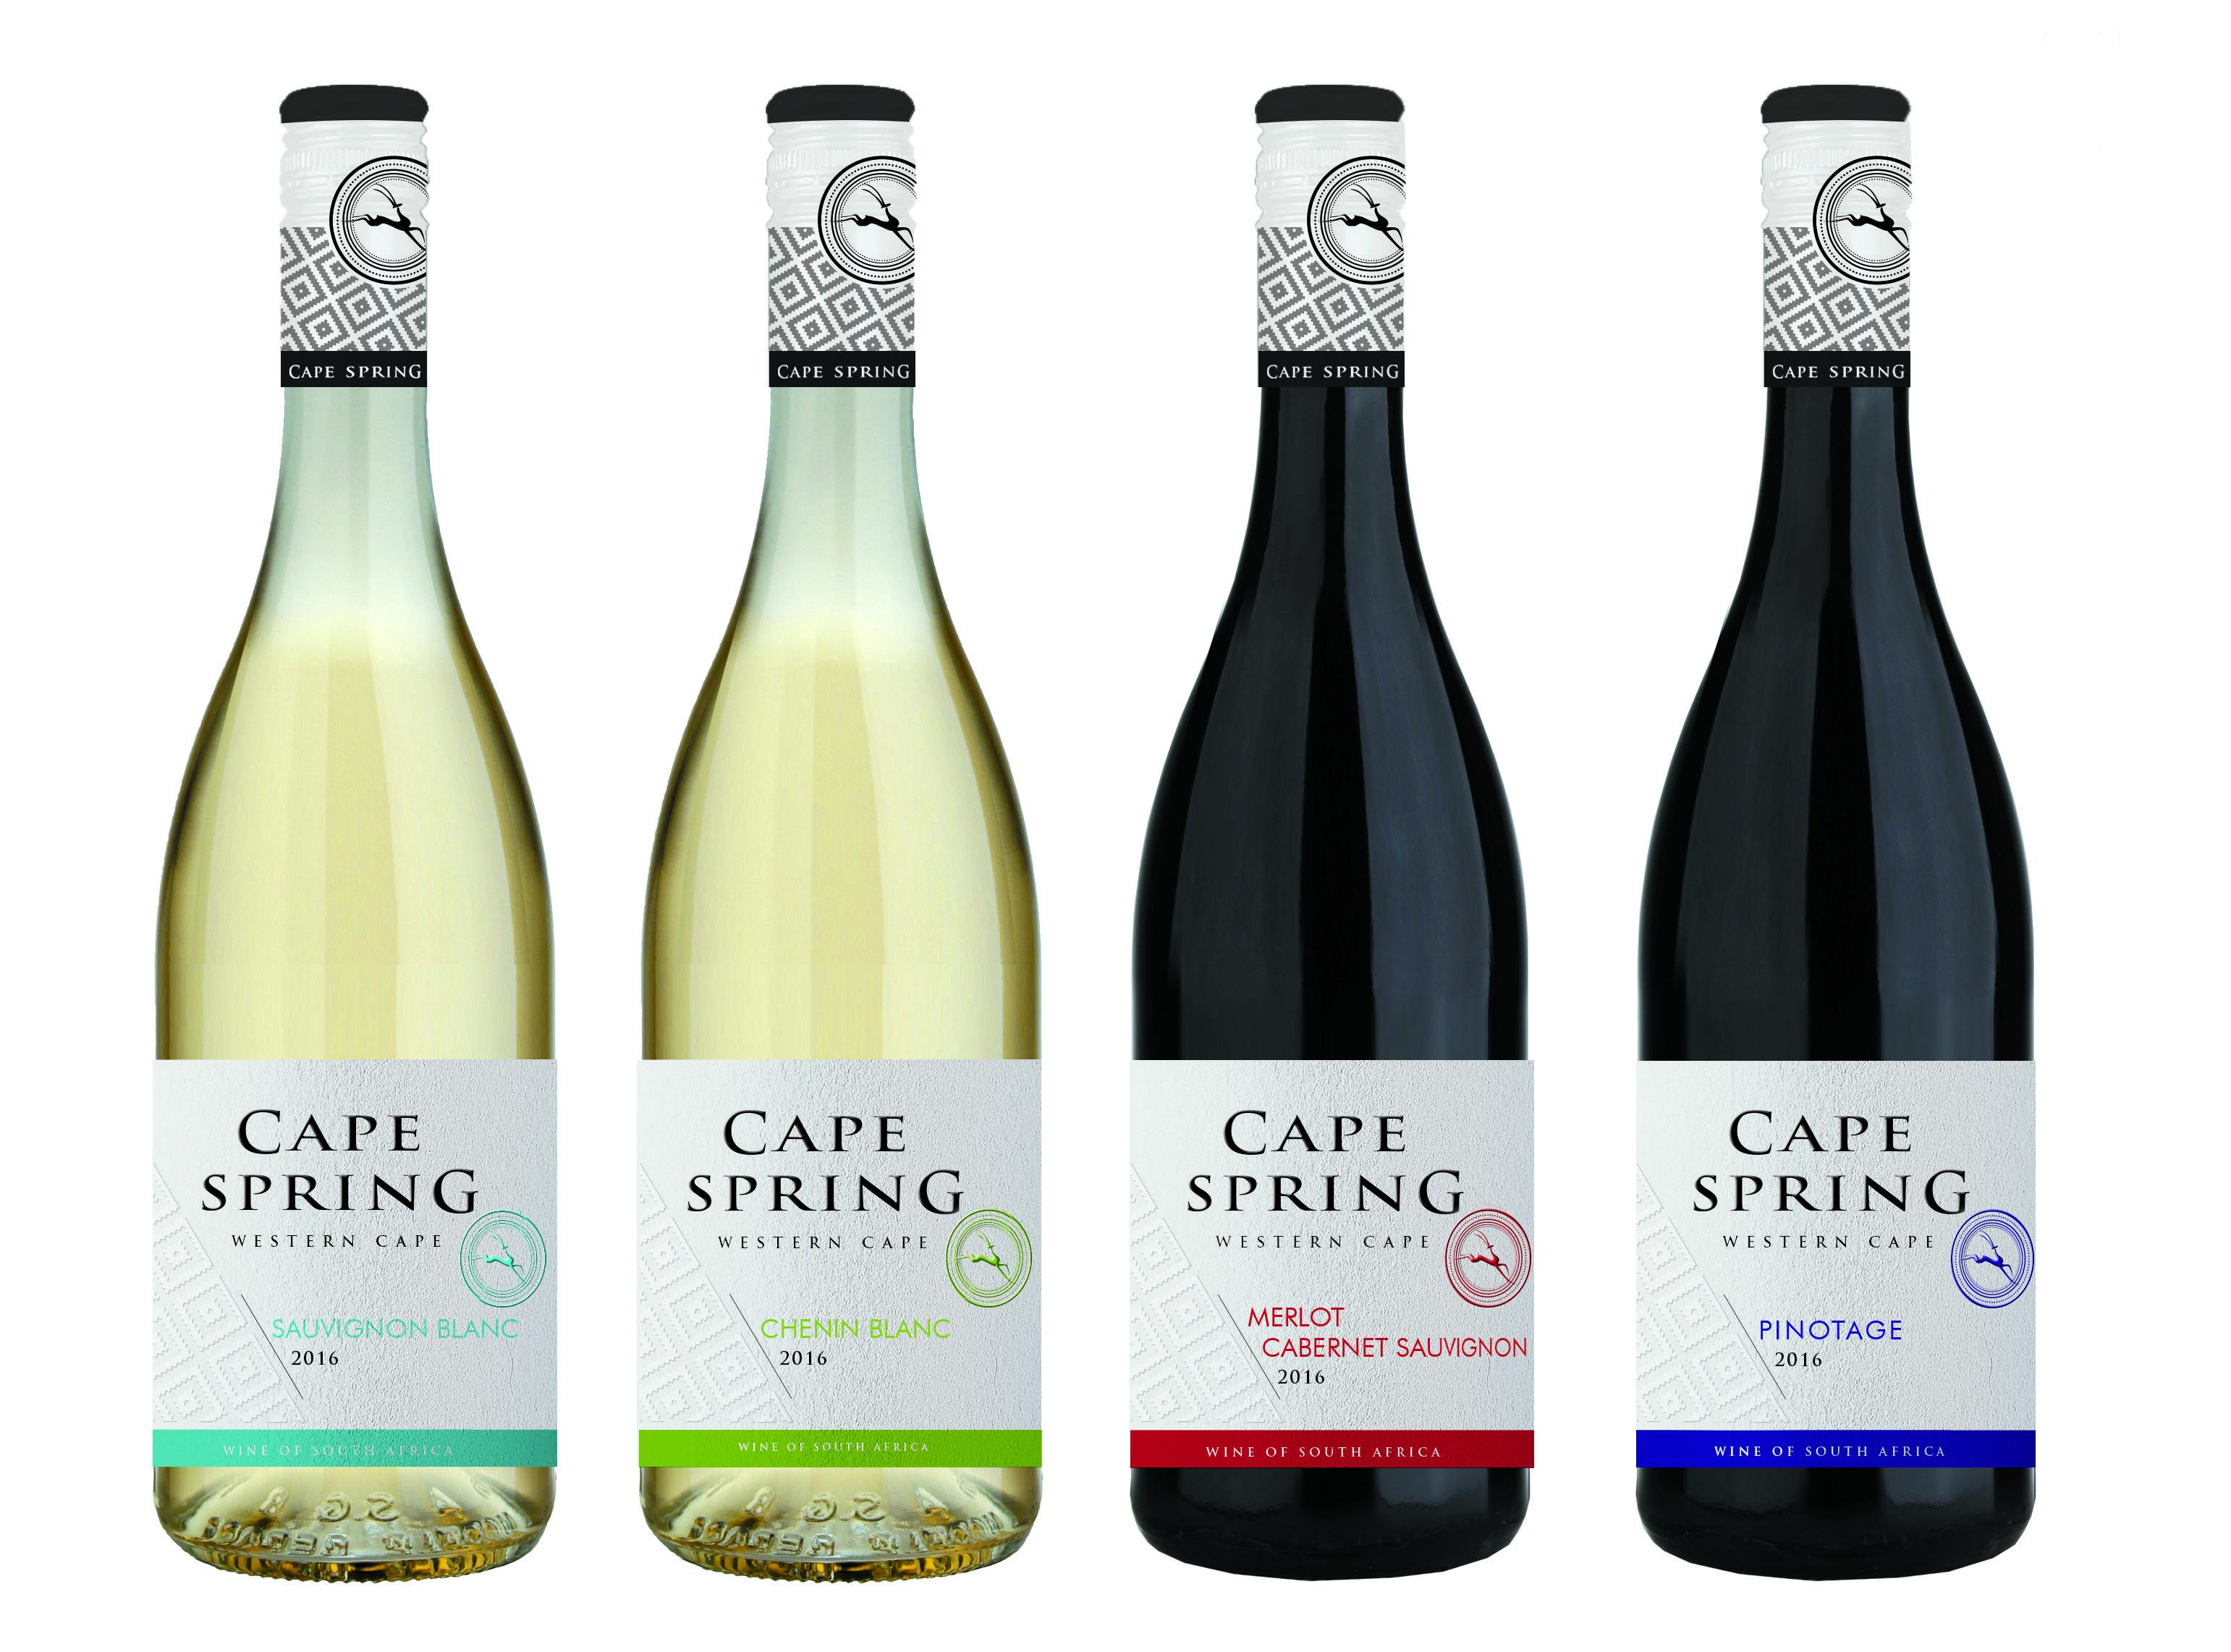 Cape Spring Western Cape